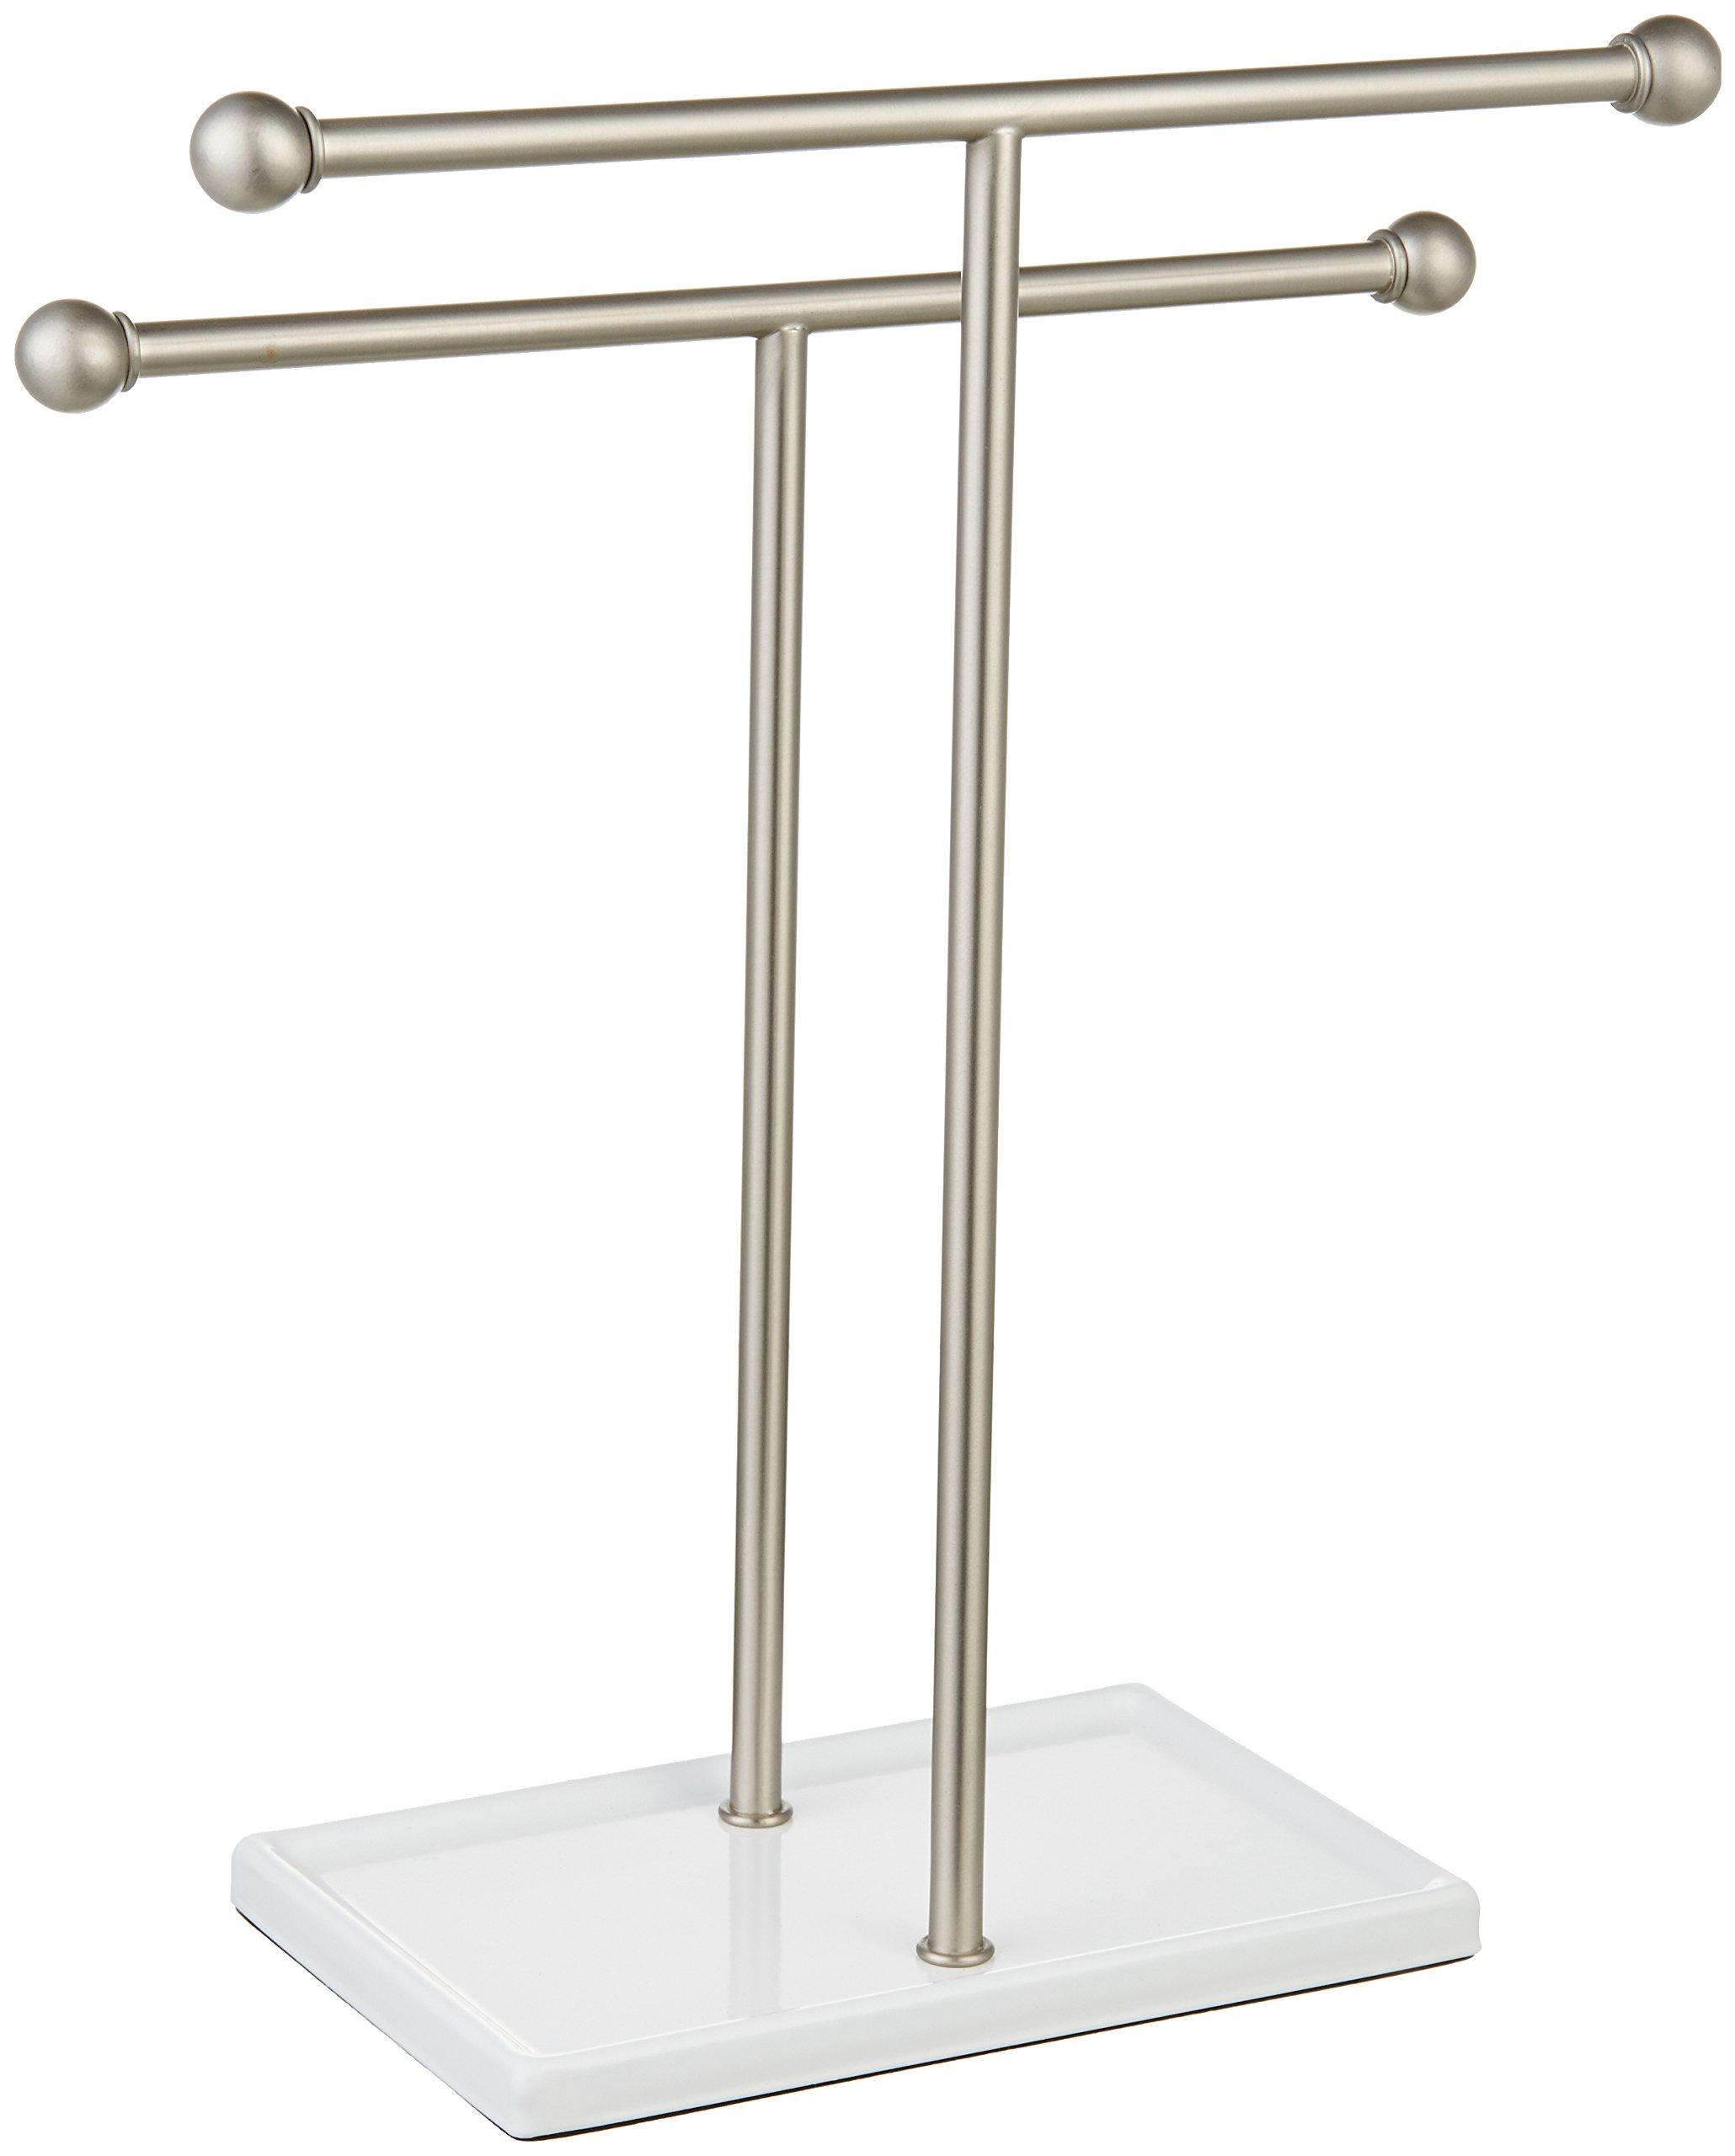 AmazonBasics Double-T Hand Towel Stand - chrome